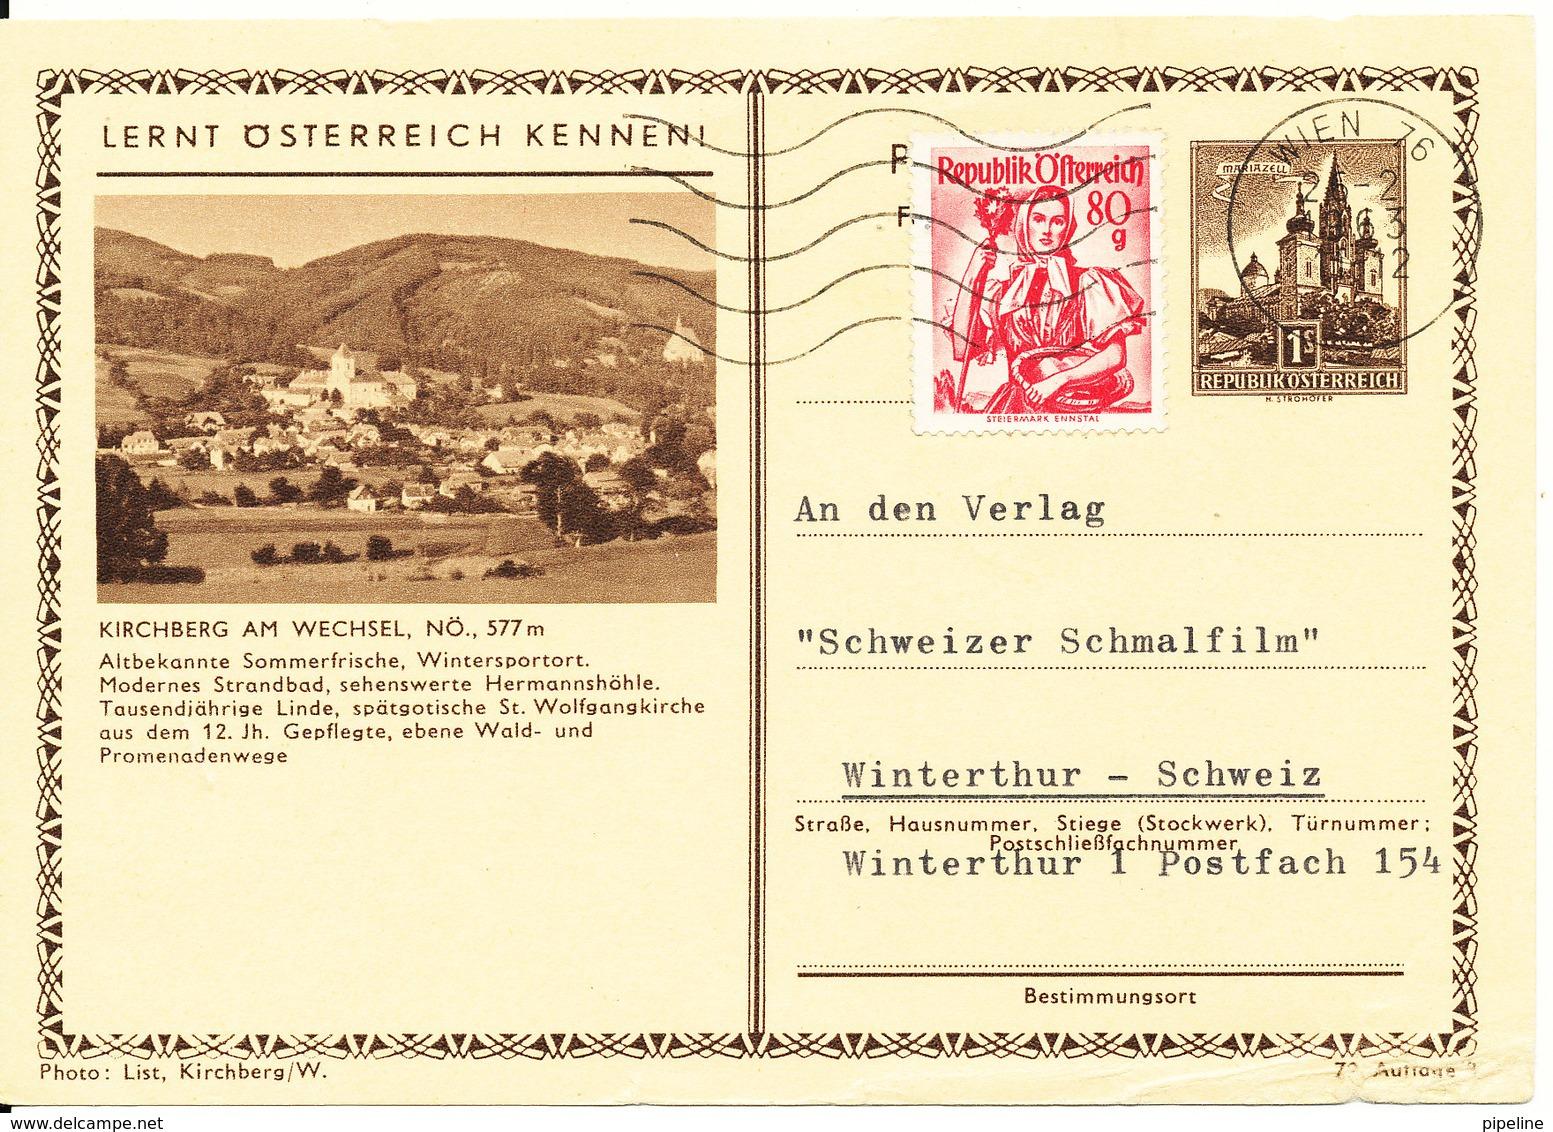 Austria Uprated Postal Stationery Postcard Wien 26-2-1963 (Kirchberg Am Wechsel) - Entiers Postaux